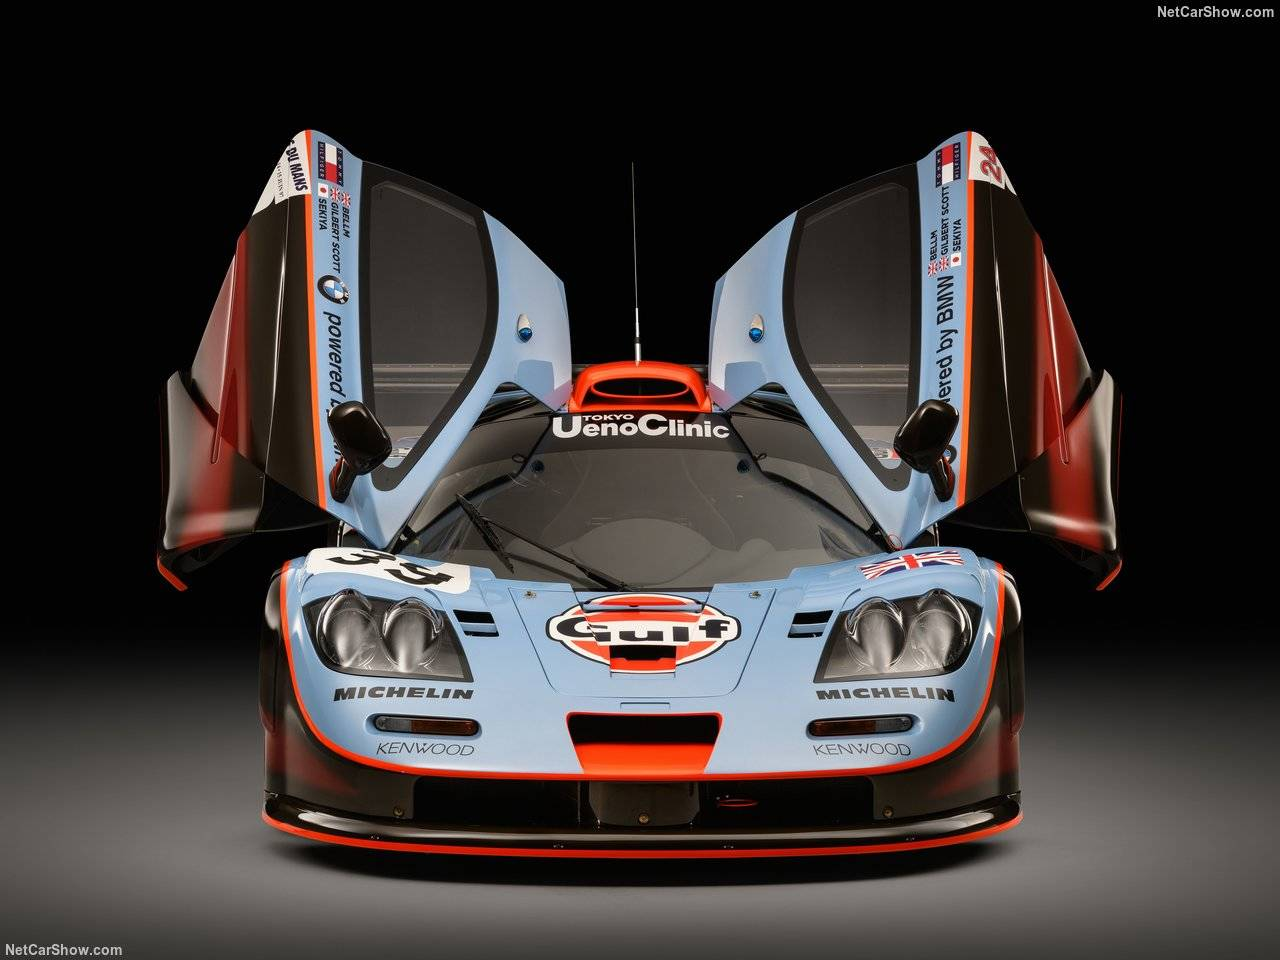 McLaren F1 GTR Longtail 25Rが、マクラーレン監修の元、復活された模様‼️